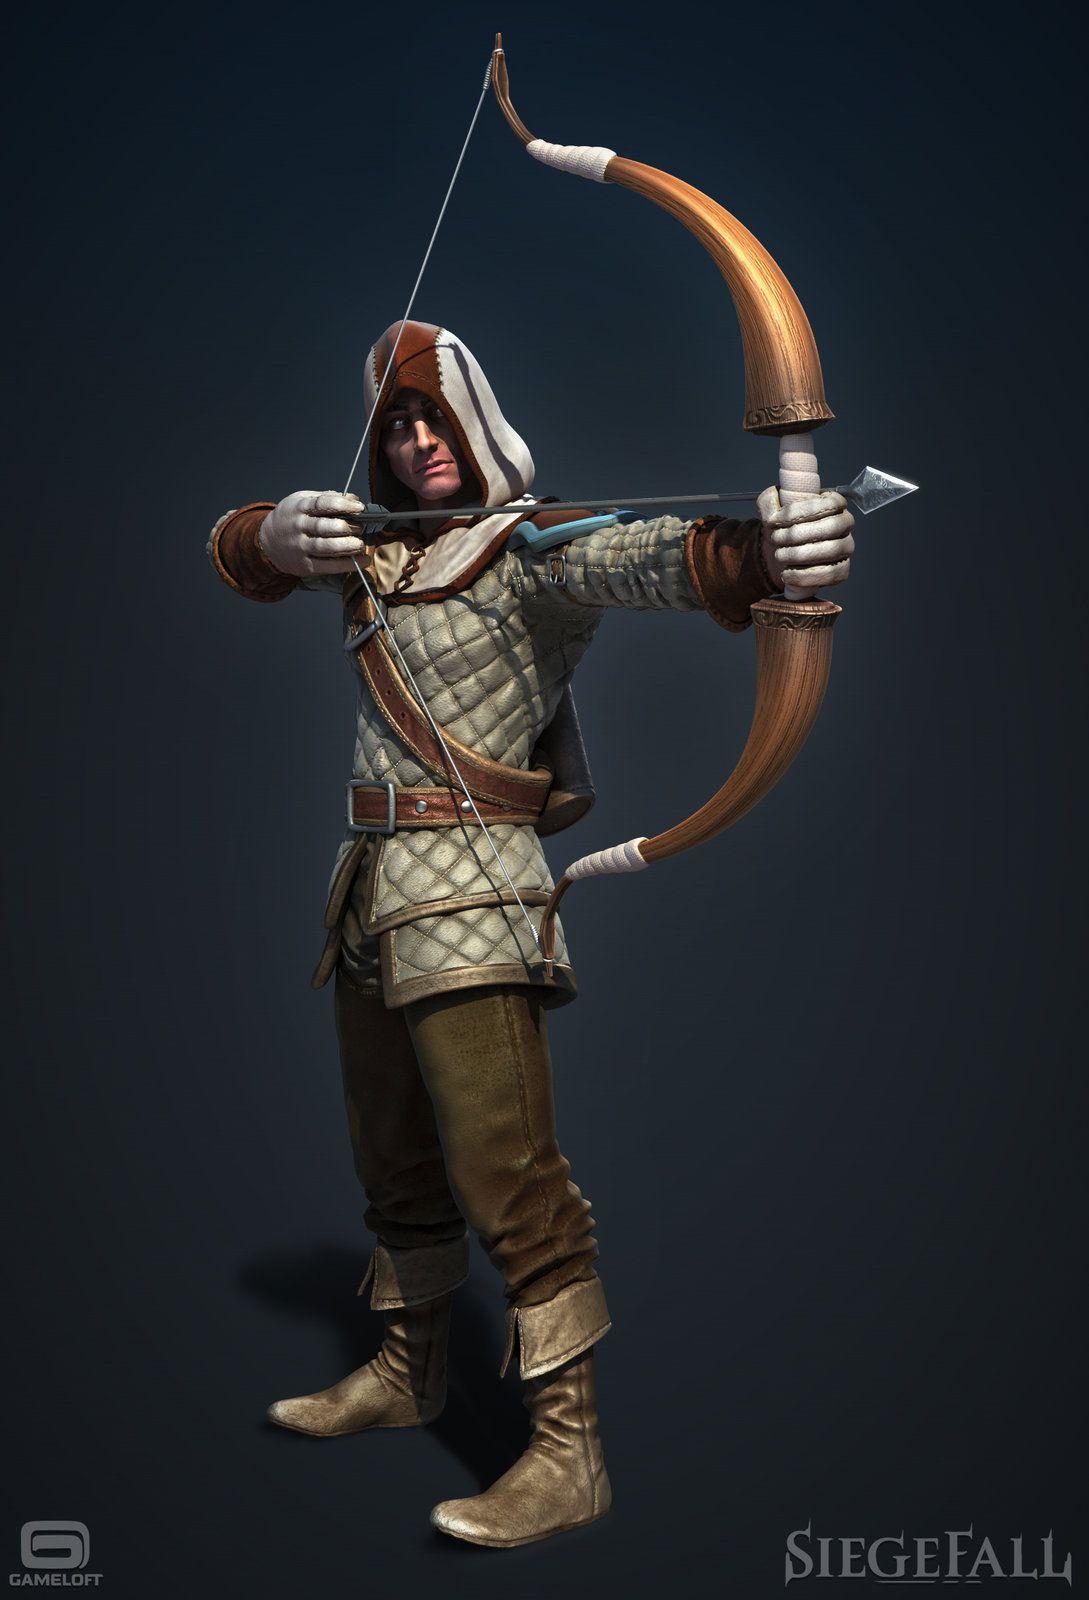 Siegefall - archer, Alexandre Proulx Audy on ArtStation at https://www.artstation.com/artwork/lDQlG